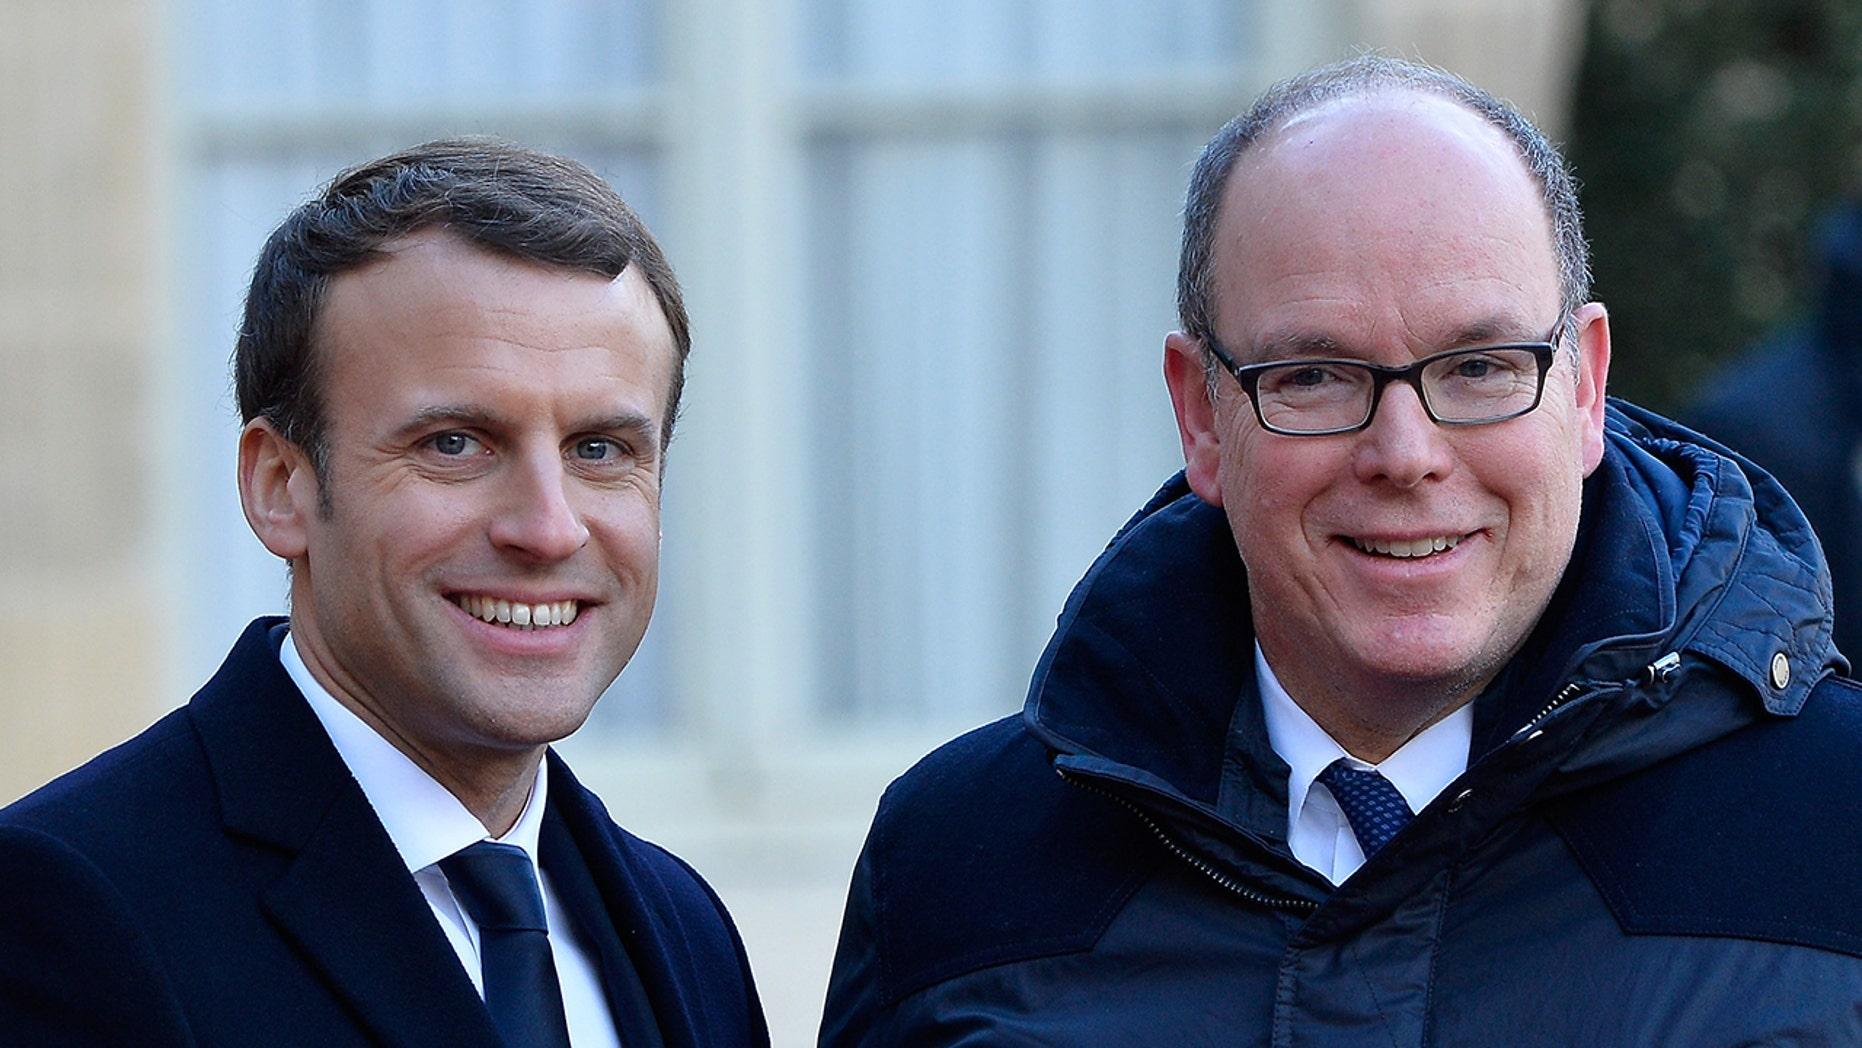 French President Emmanuel Macron and Prince Albert II of Monaco on Dec. 12, 2017 in Paris.